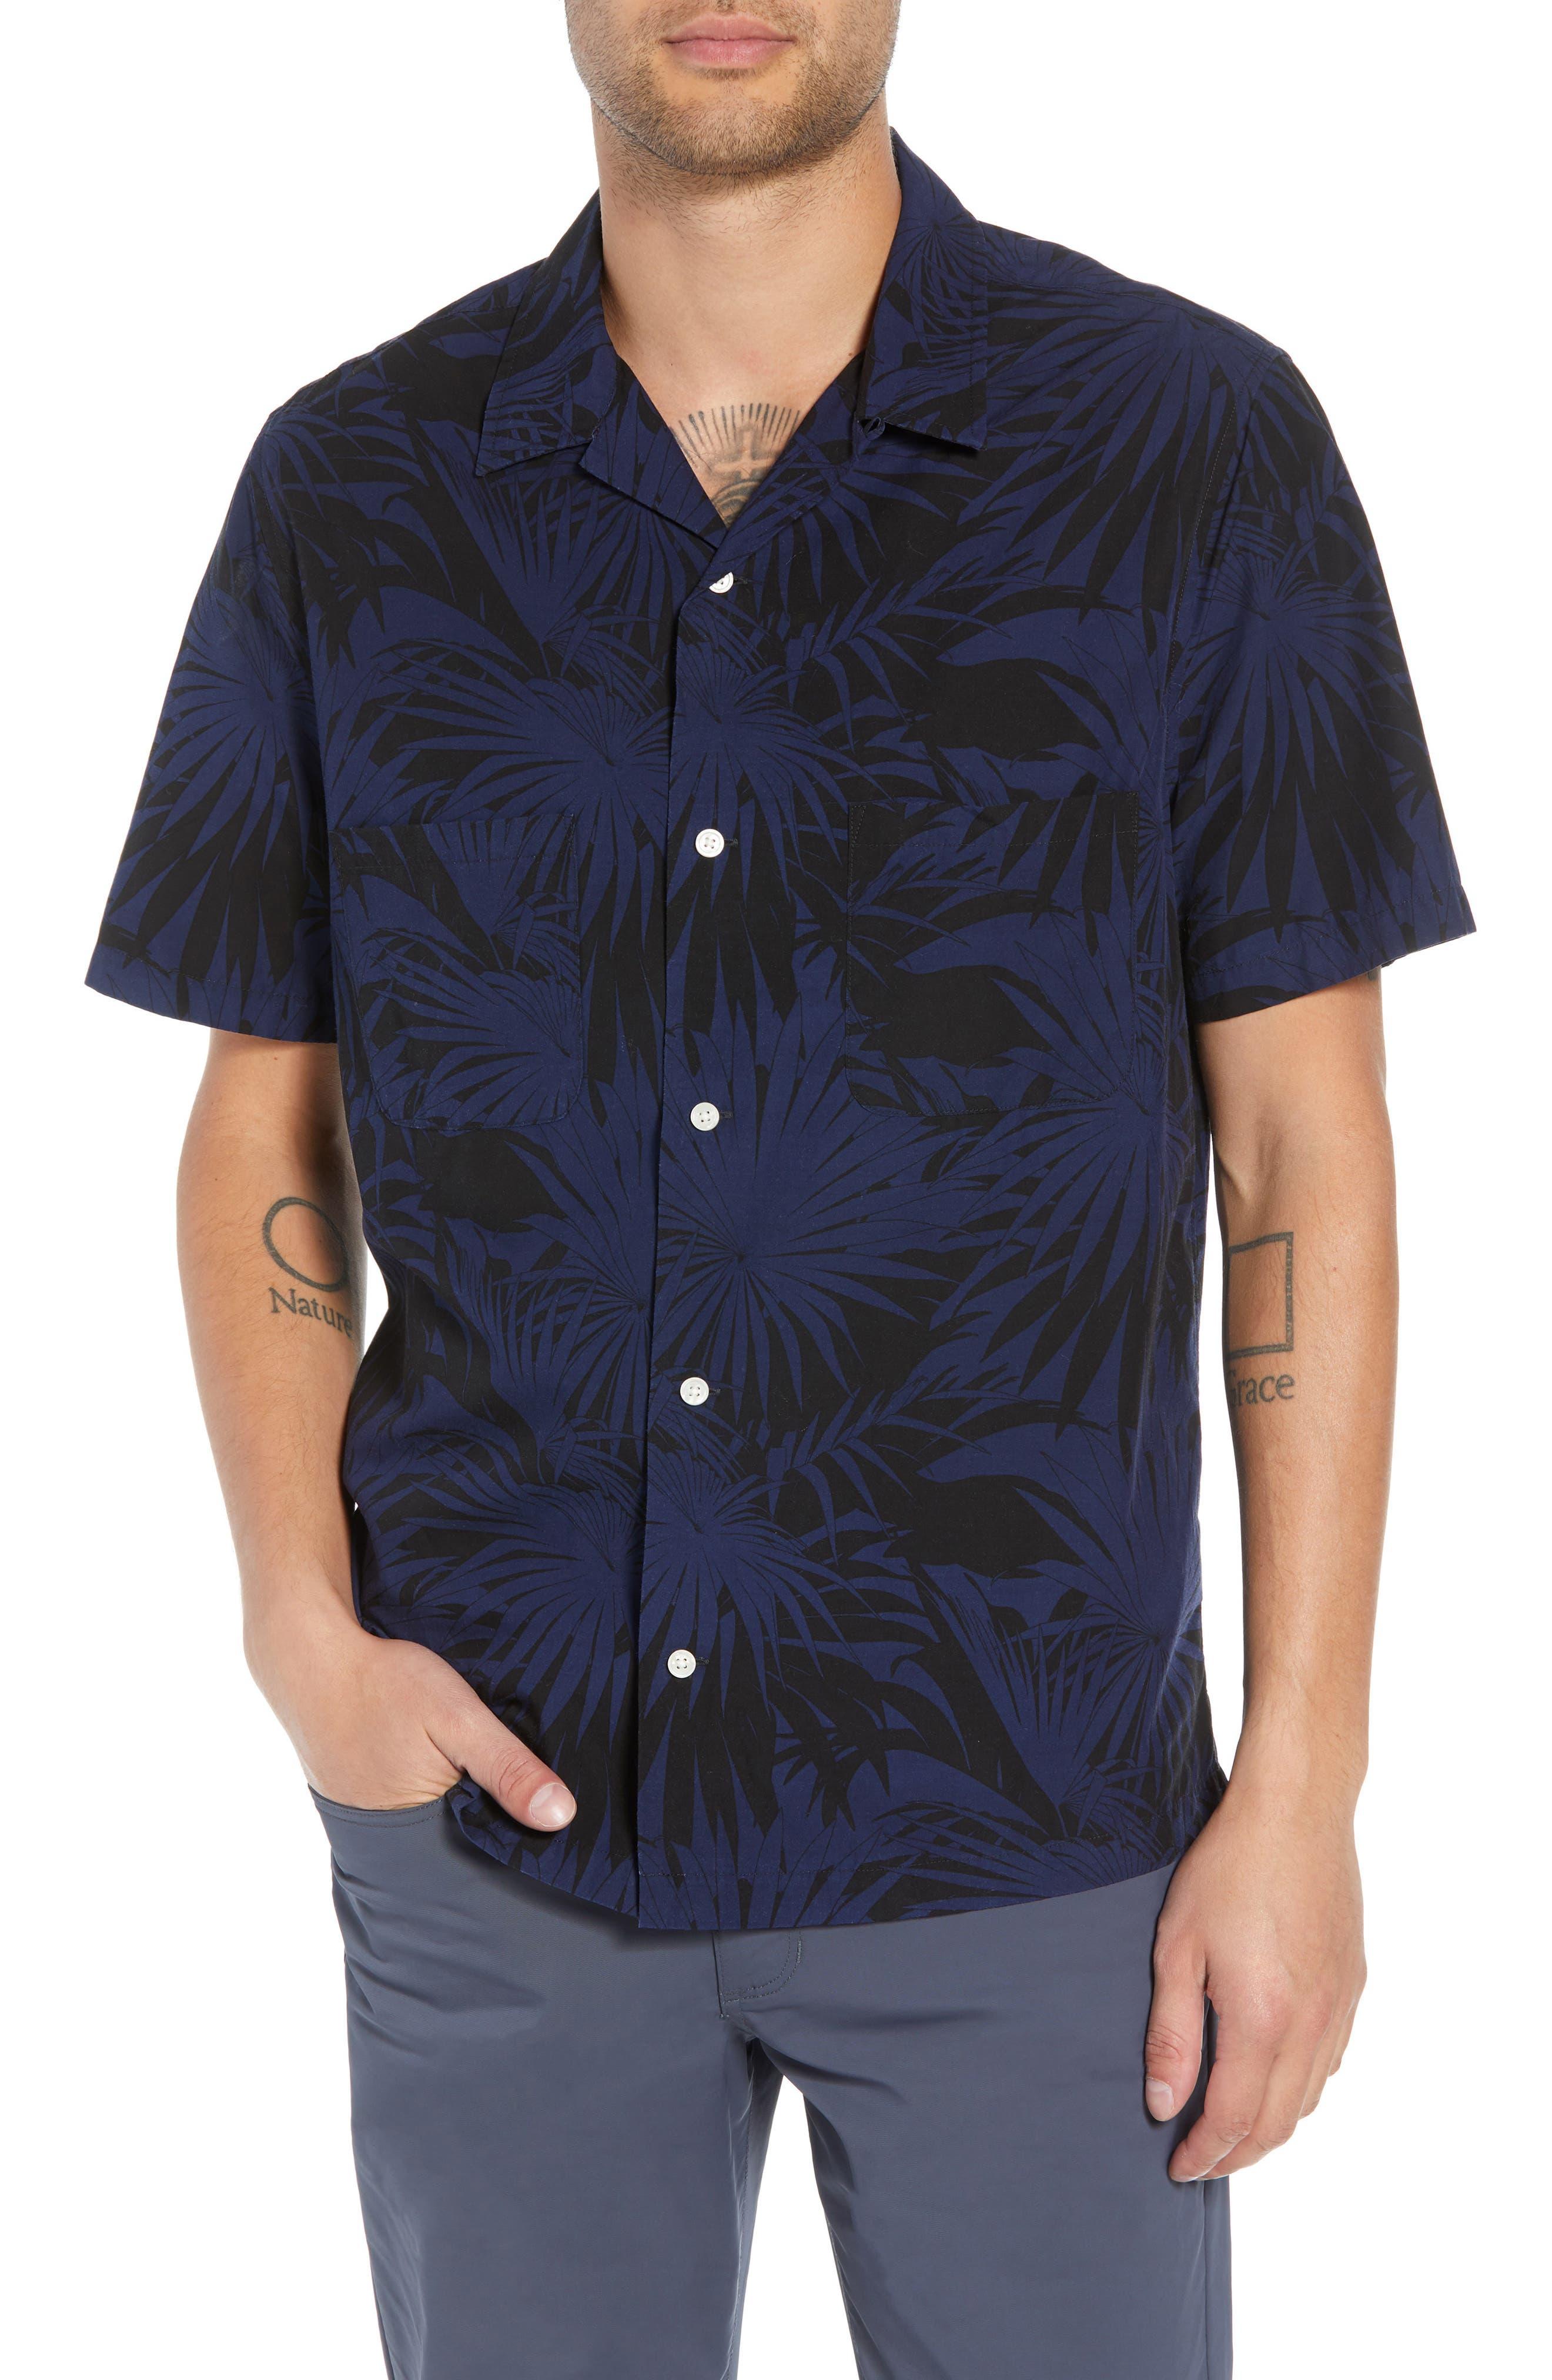 Palm Leaf Cabana Woven Shirt,                         Main,                         color, 001